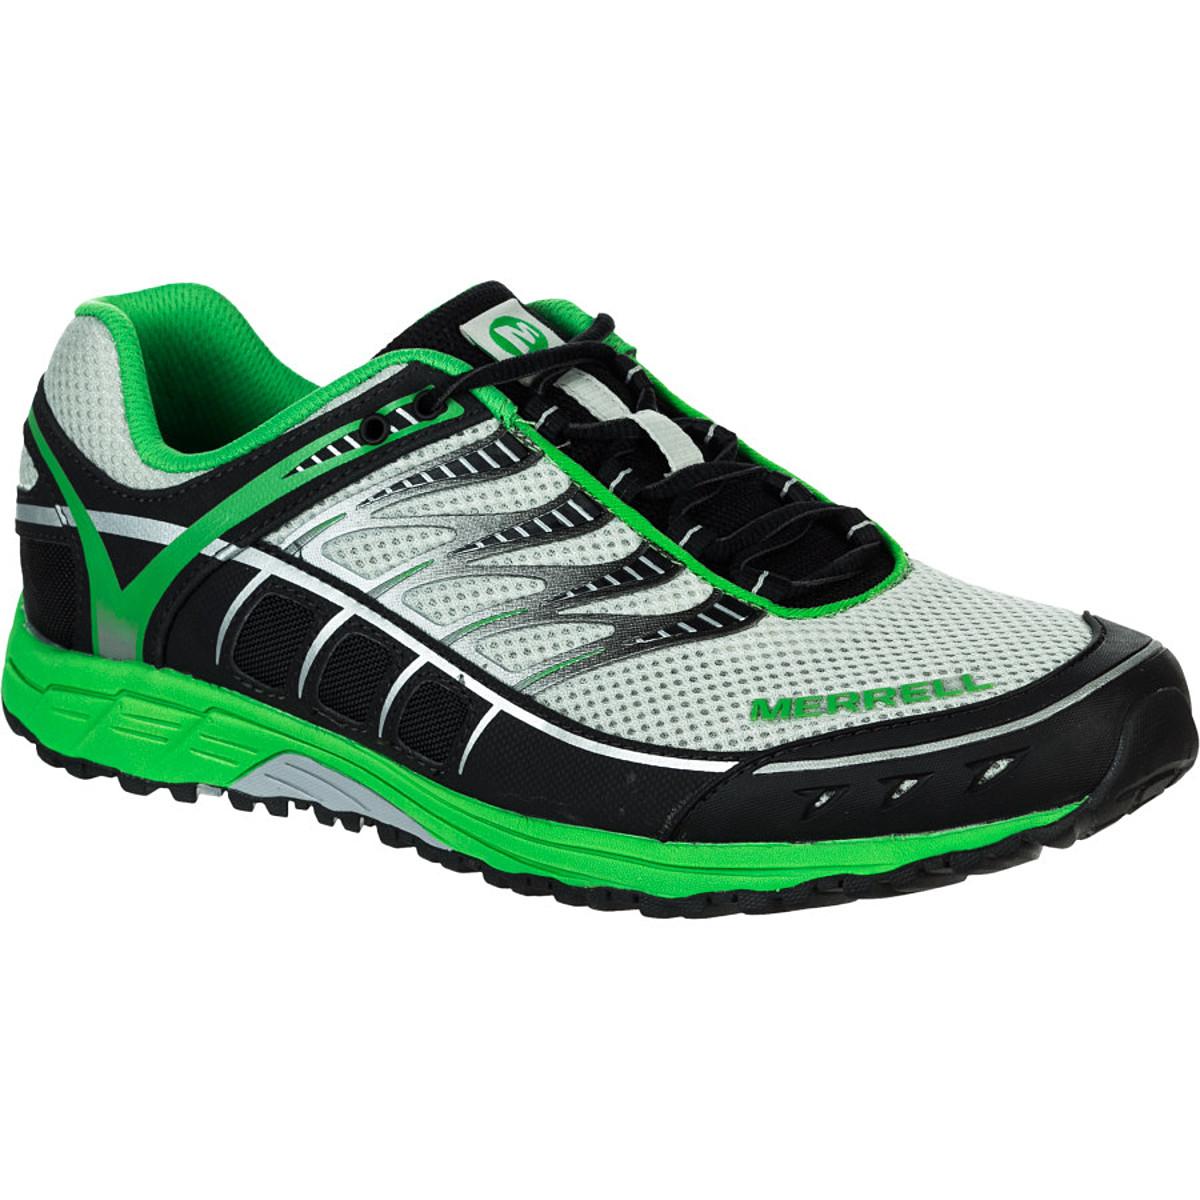 photo: Merrell Mix Master Tuff trail running shoe